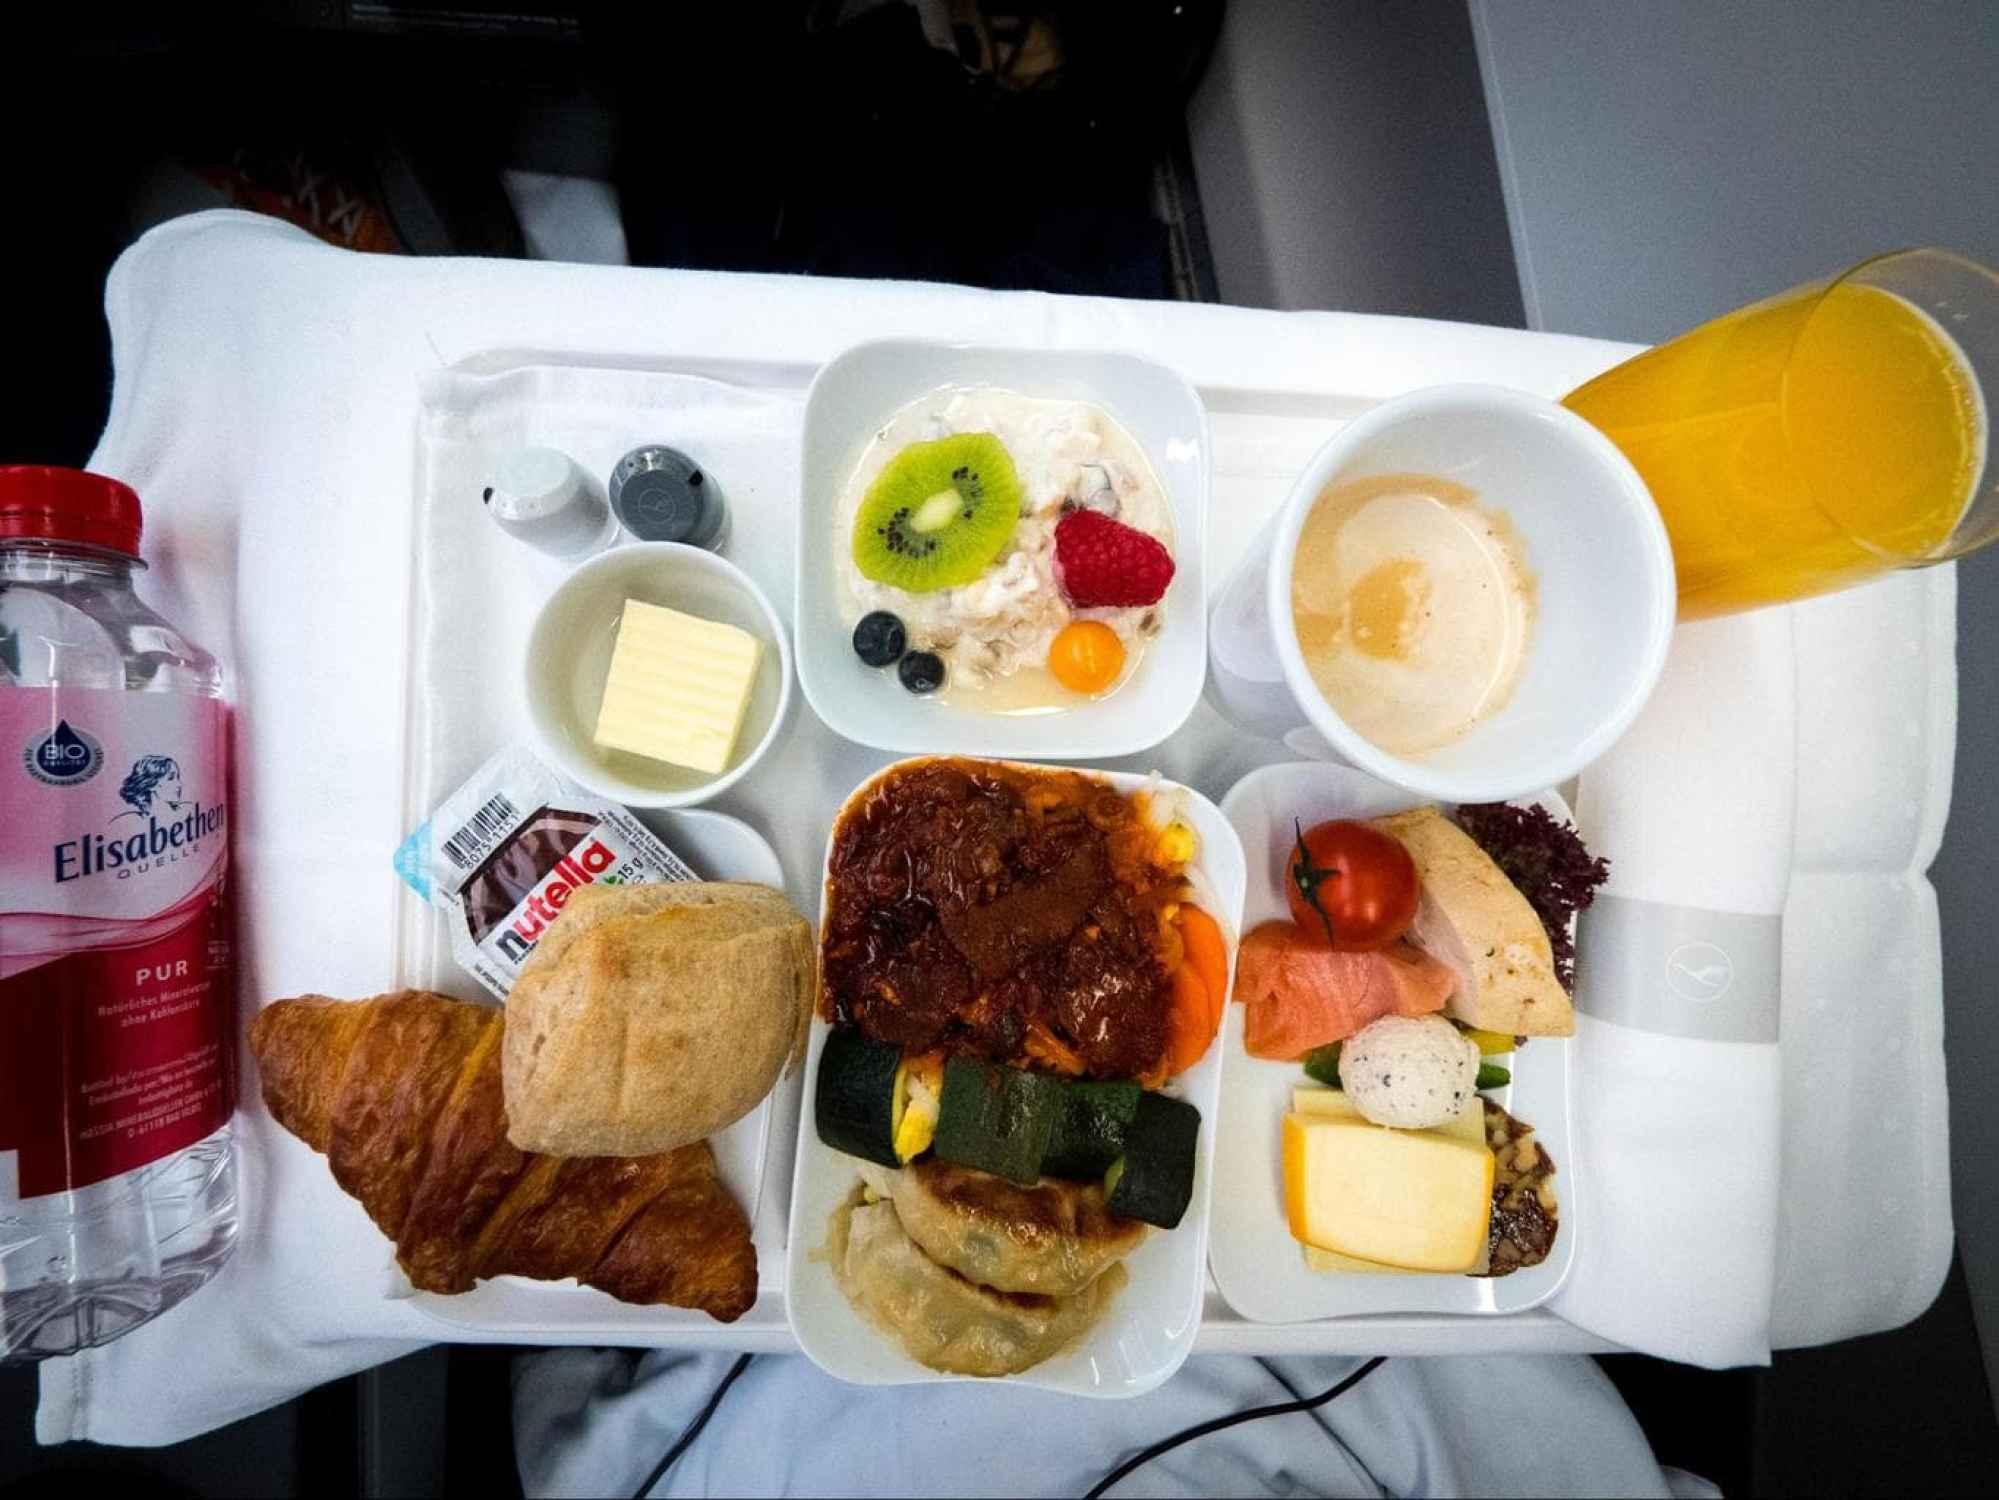 Lufthansa Business Class food - His breakfast